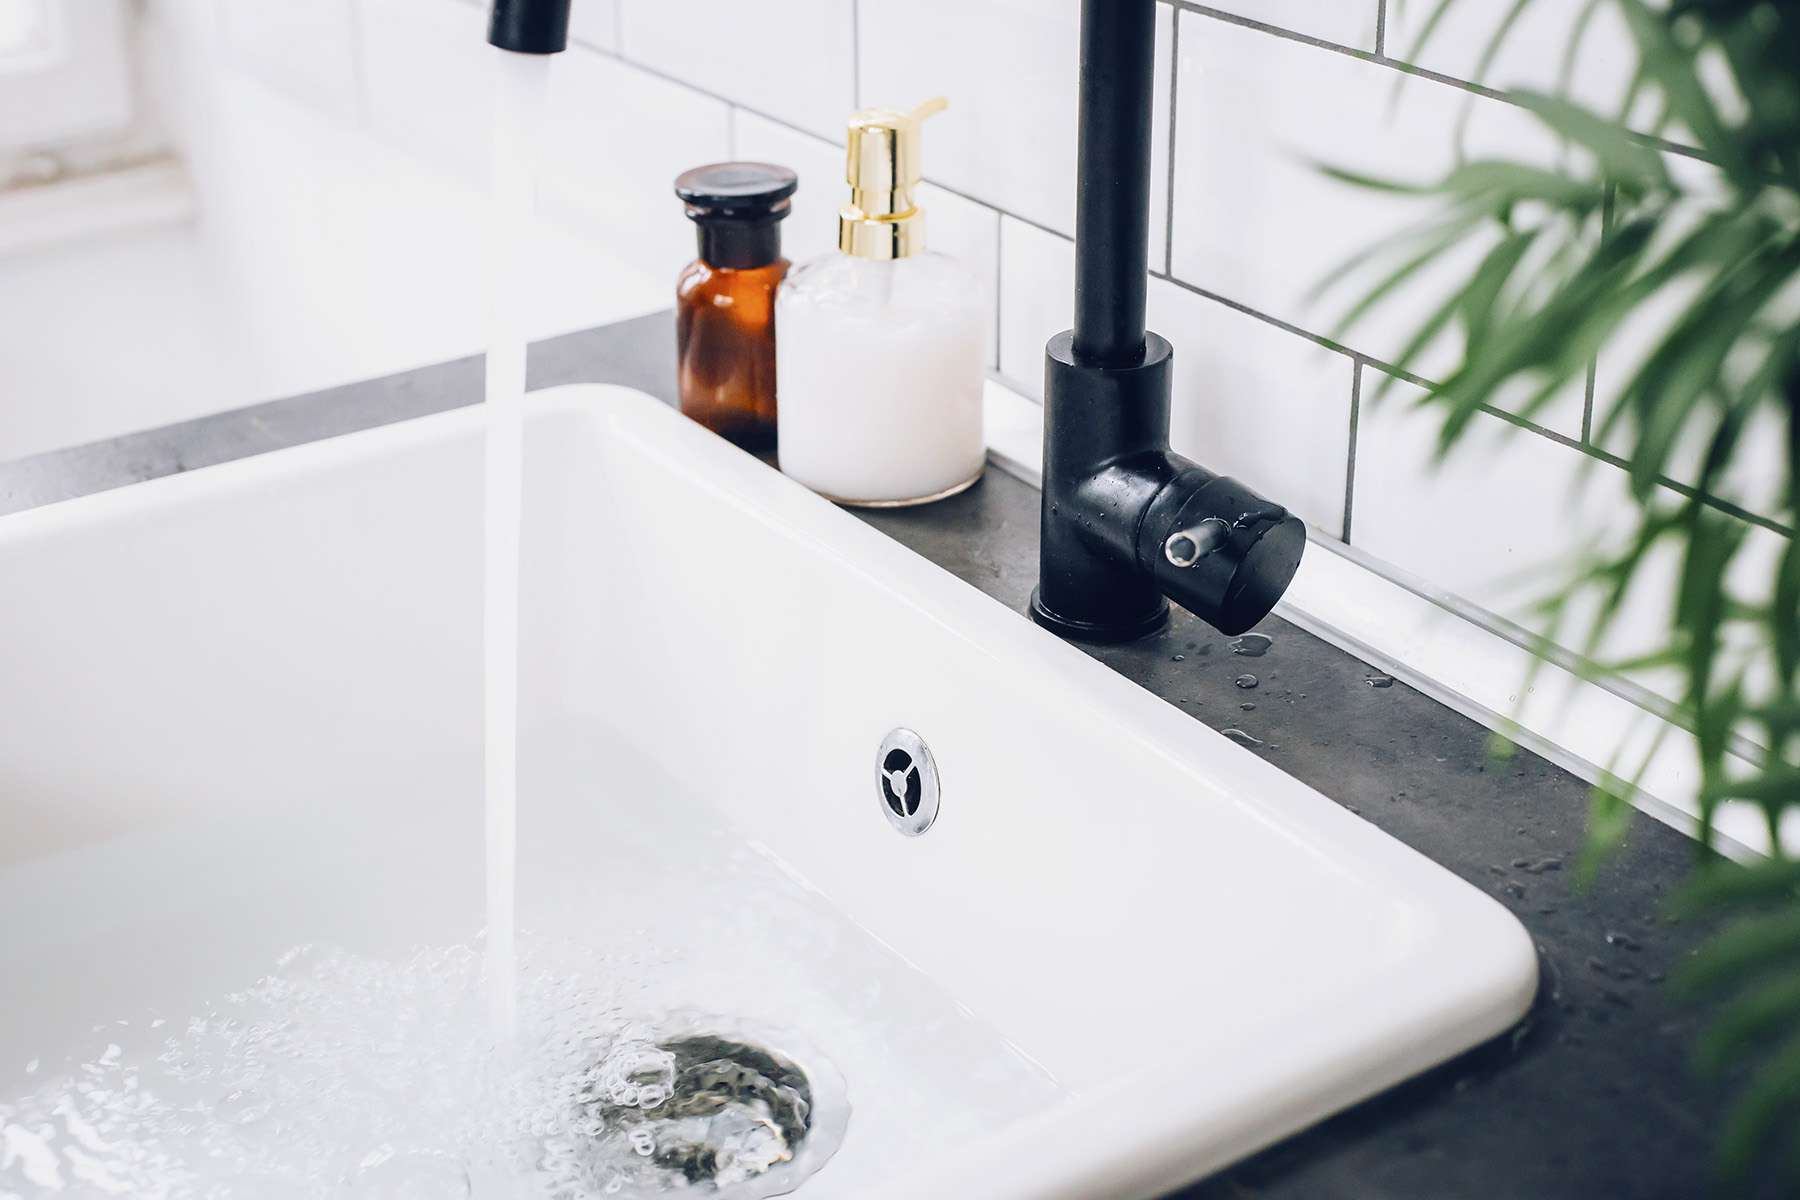 Water running in a sink